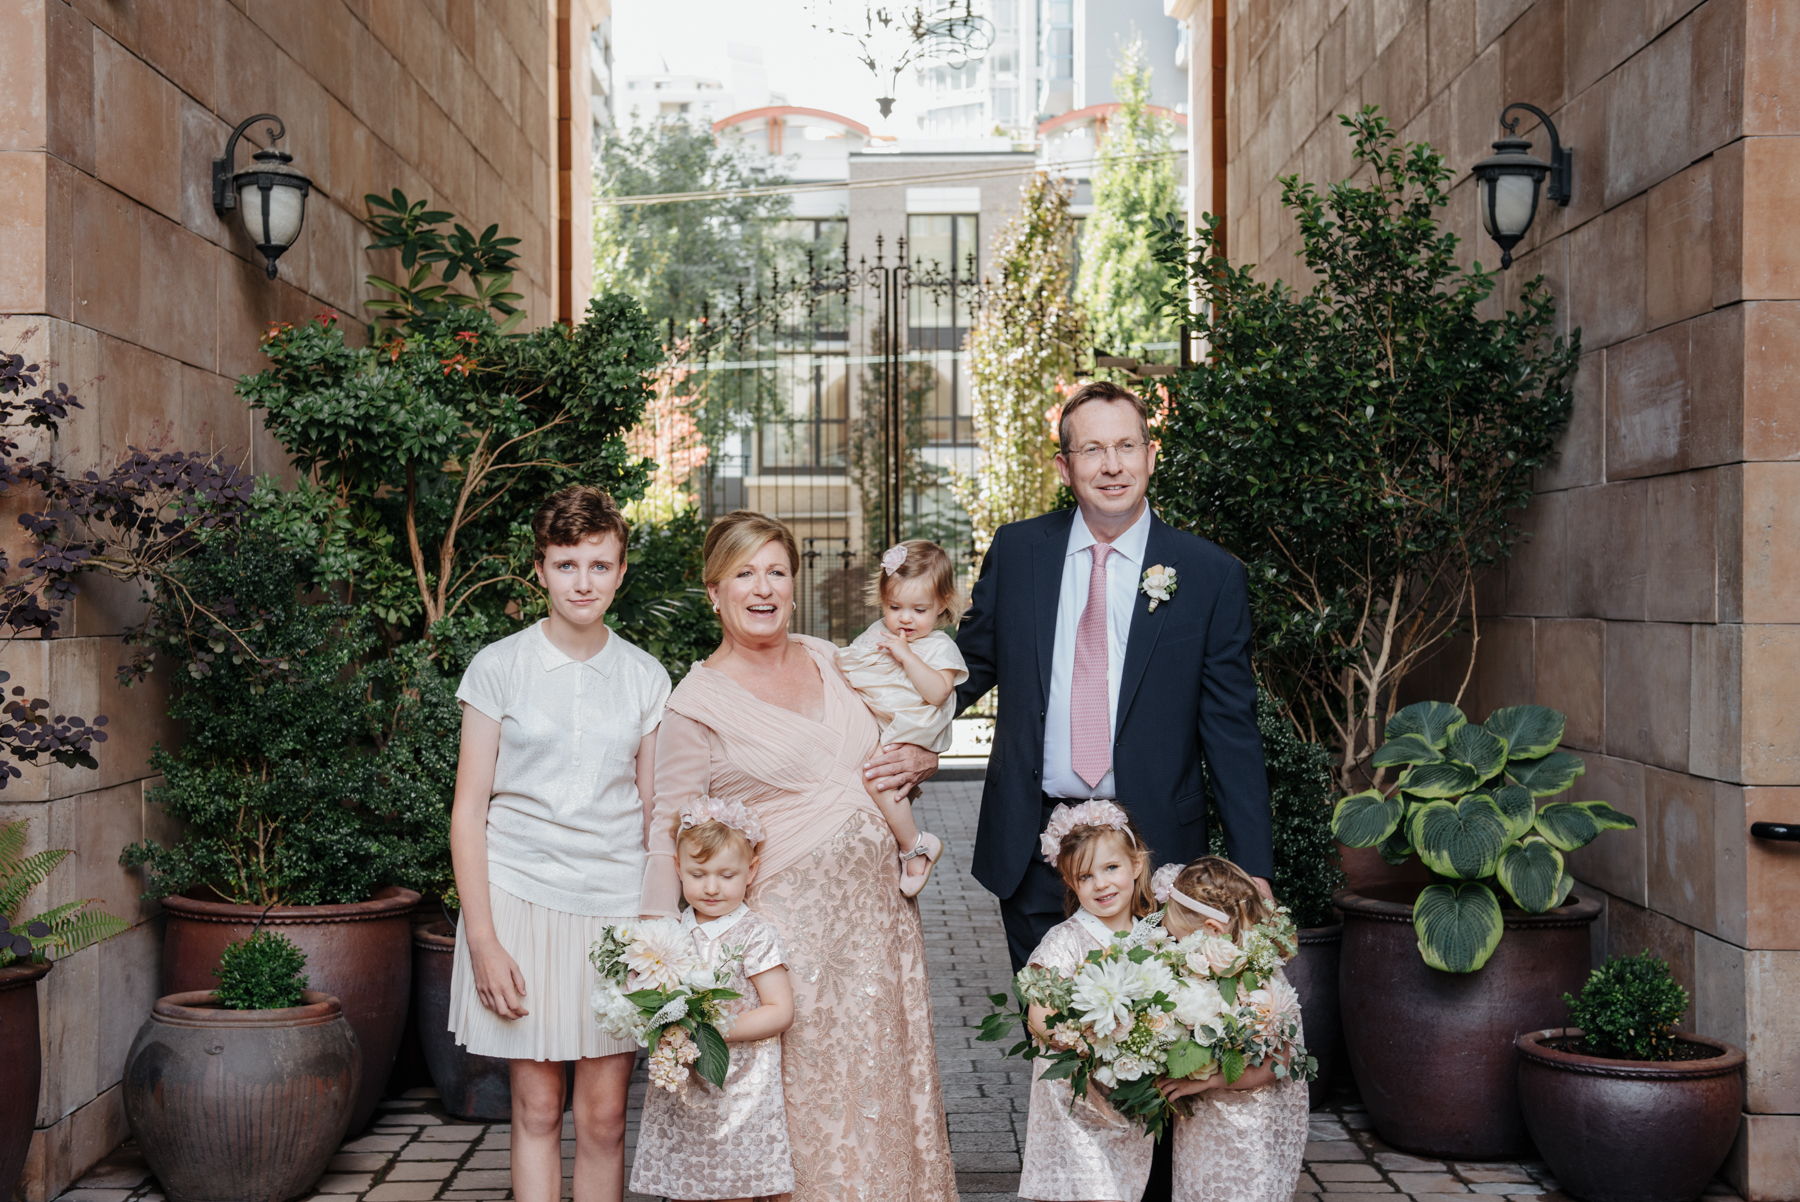 kaoverii_silva_photographer_cynthia_richard_wedding_vancouver_brix_&_mortar-8.jpg